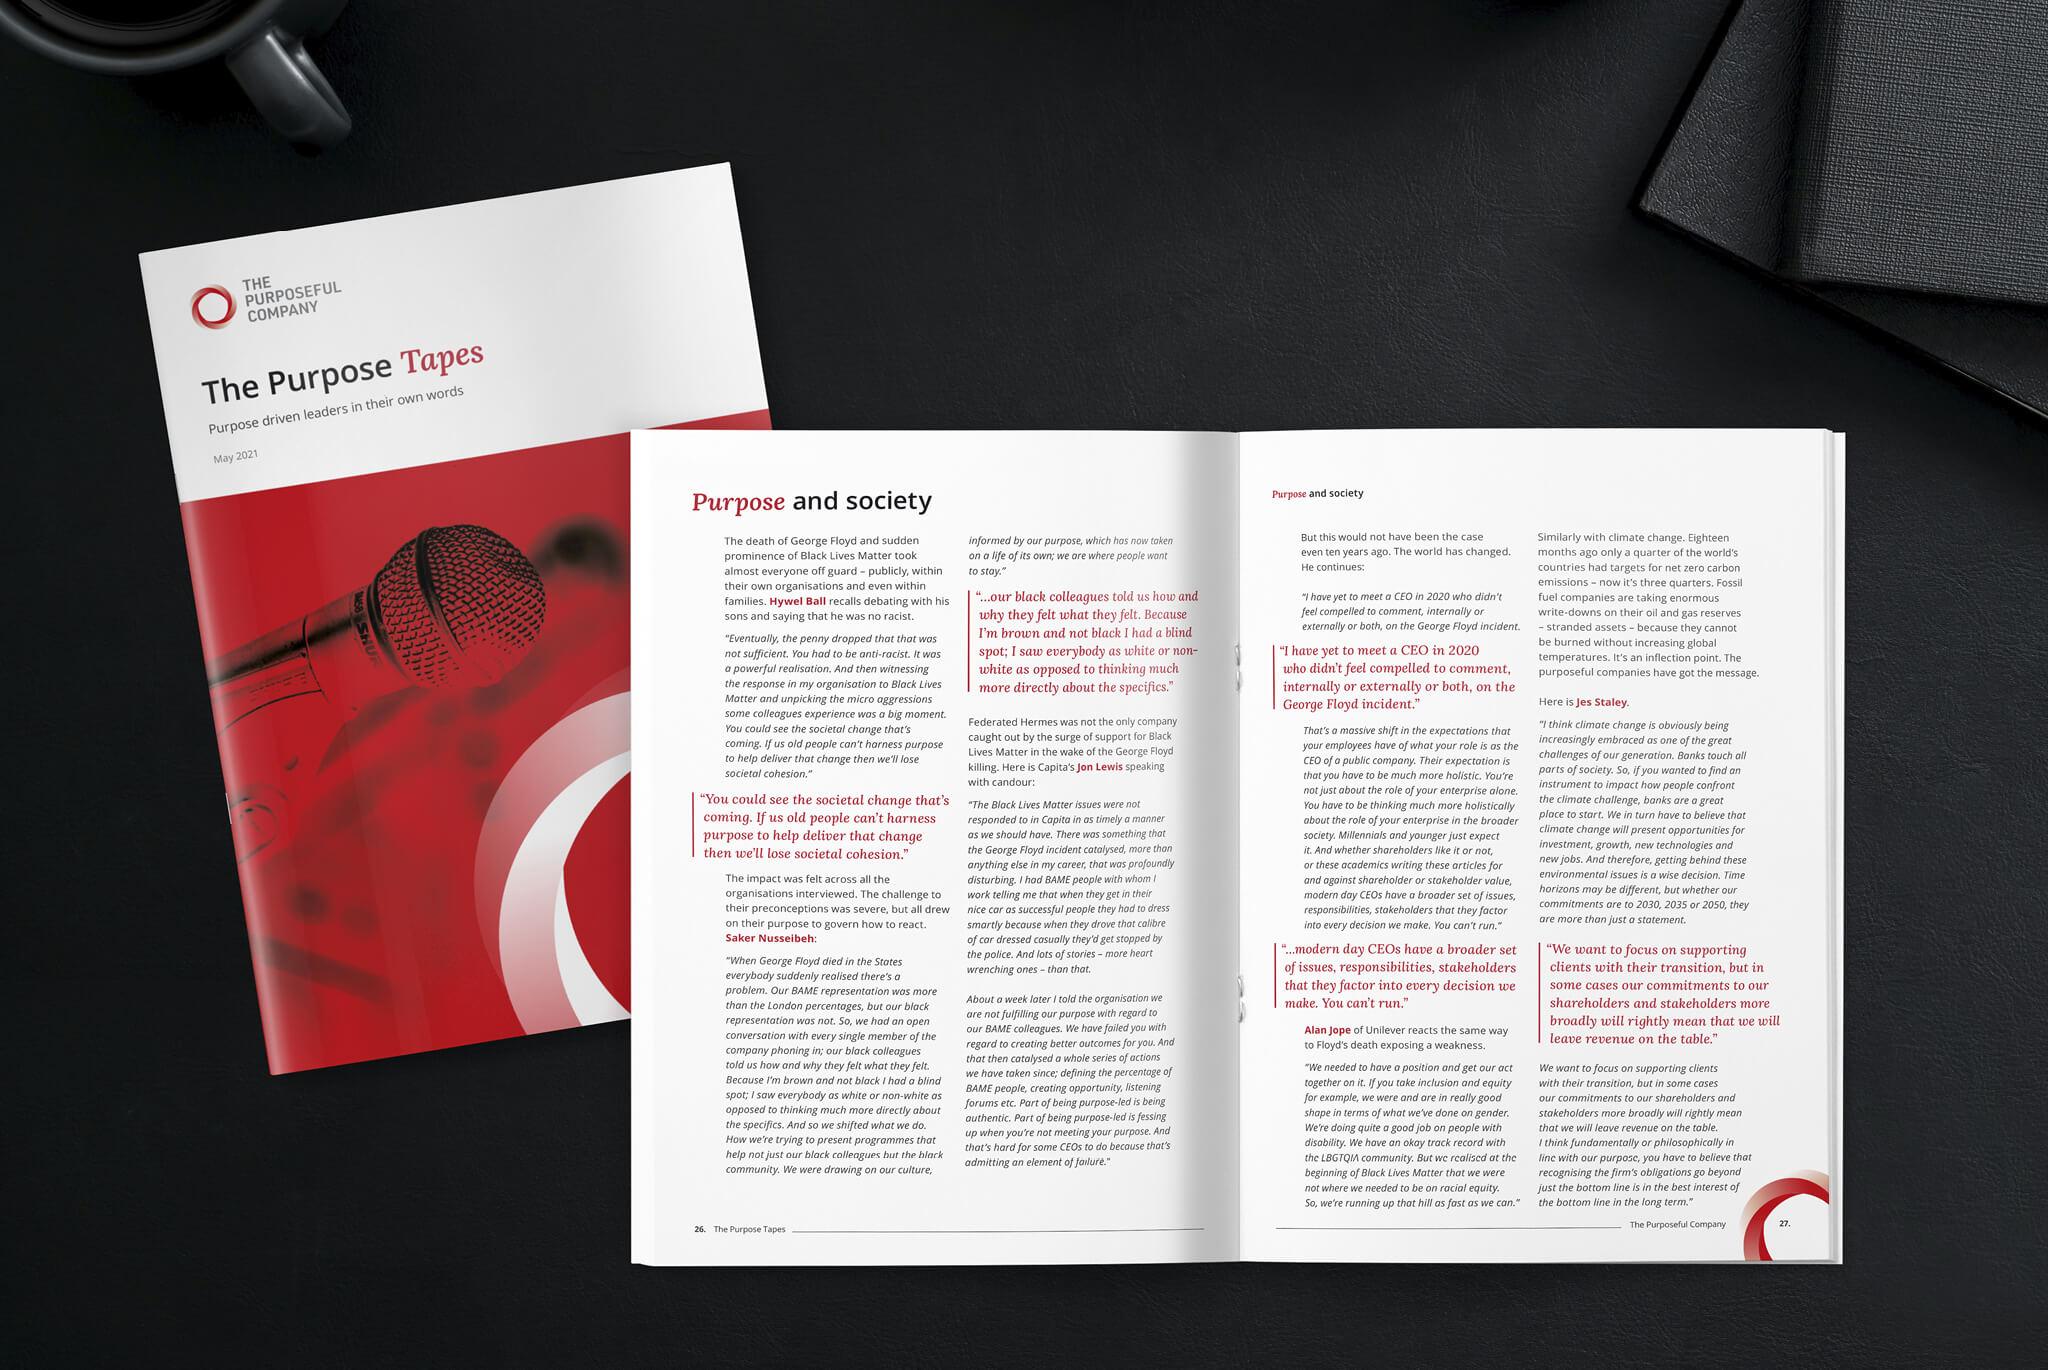 The Purposeful Company Report